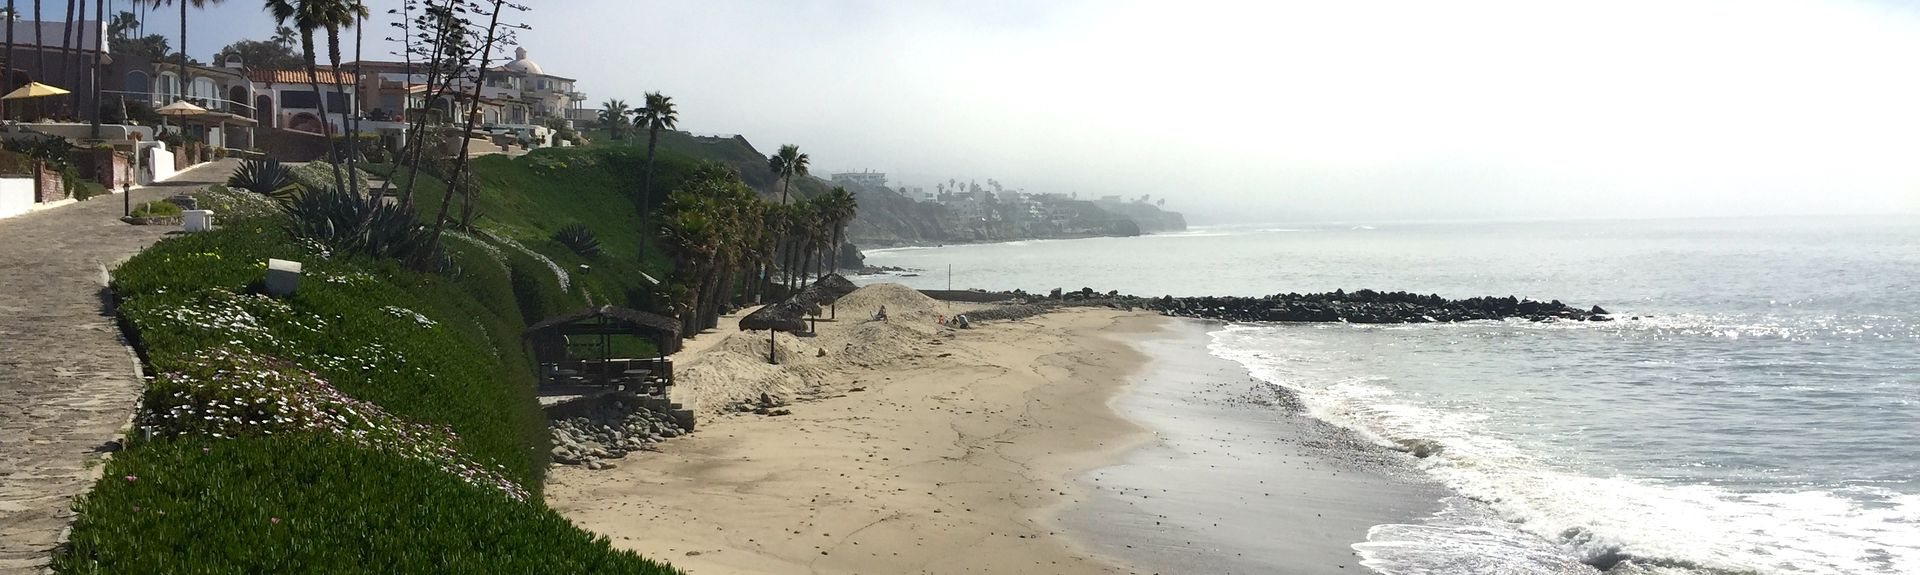 Playas de Rosarito Municipality, Baja California, Mexico